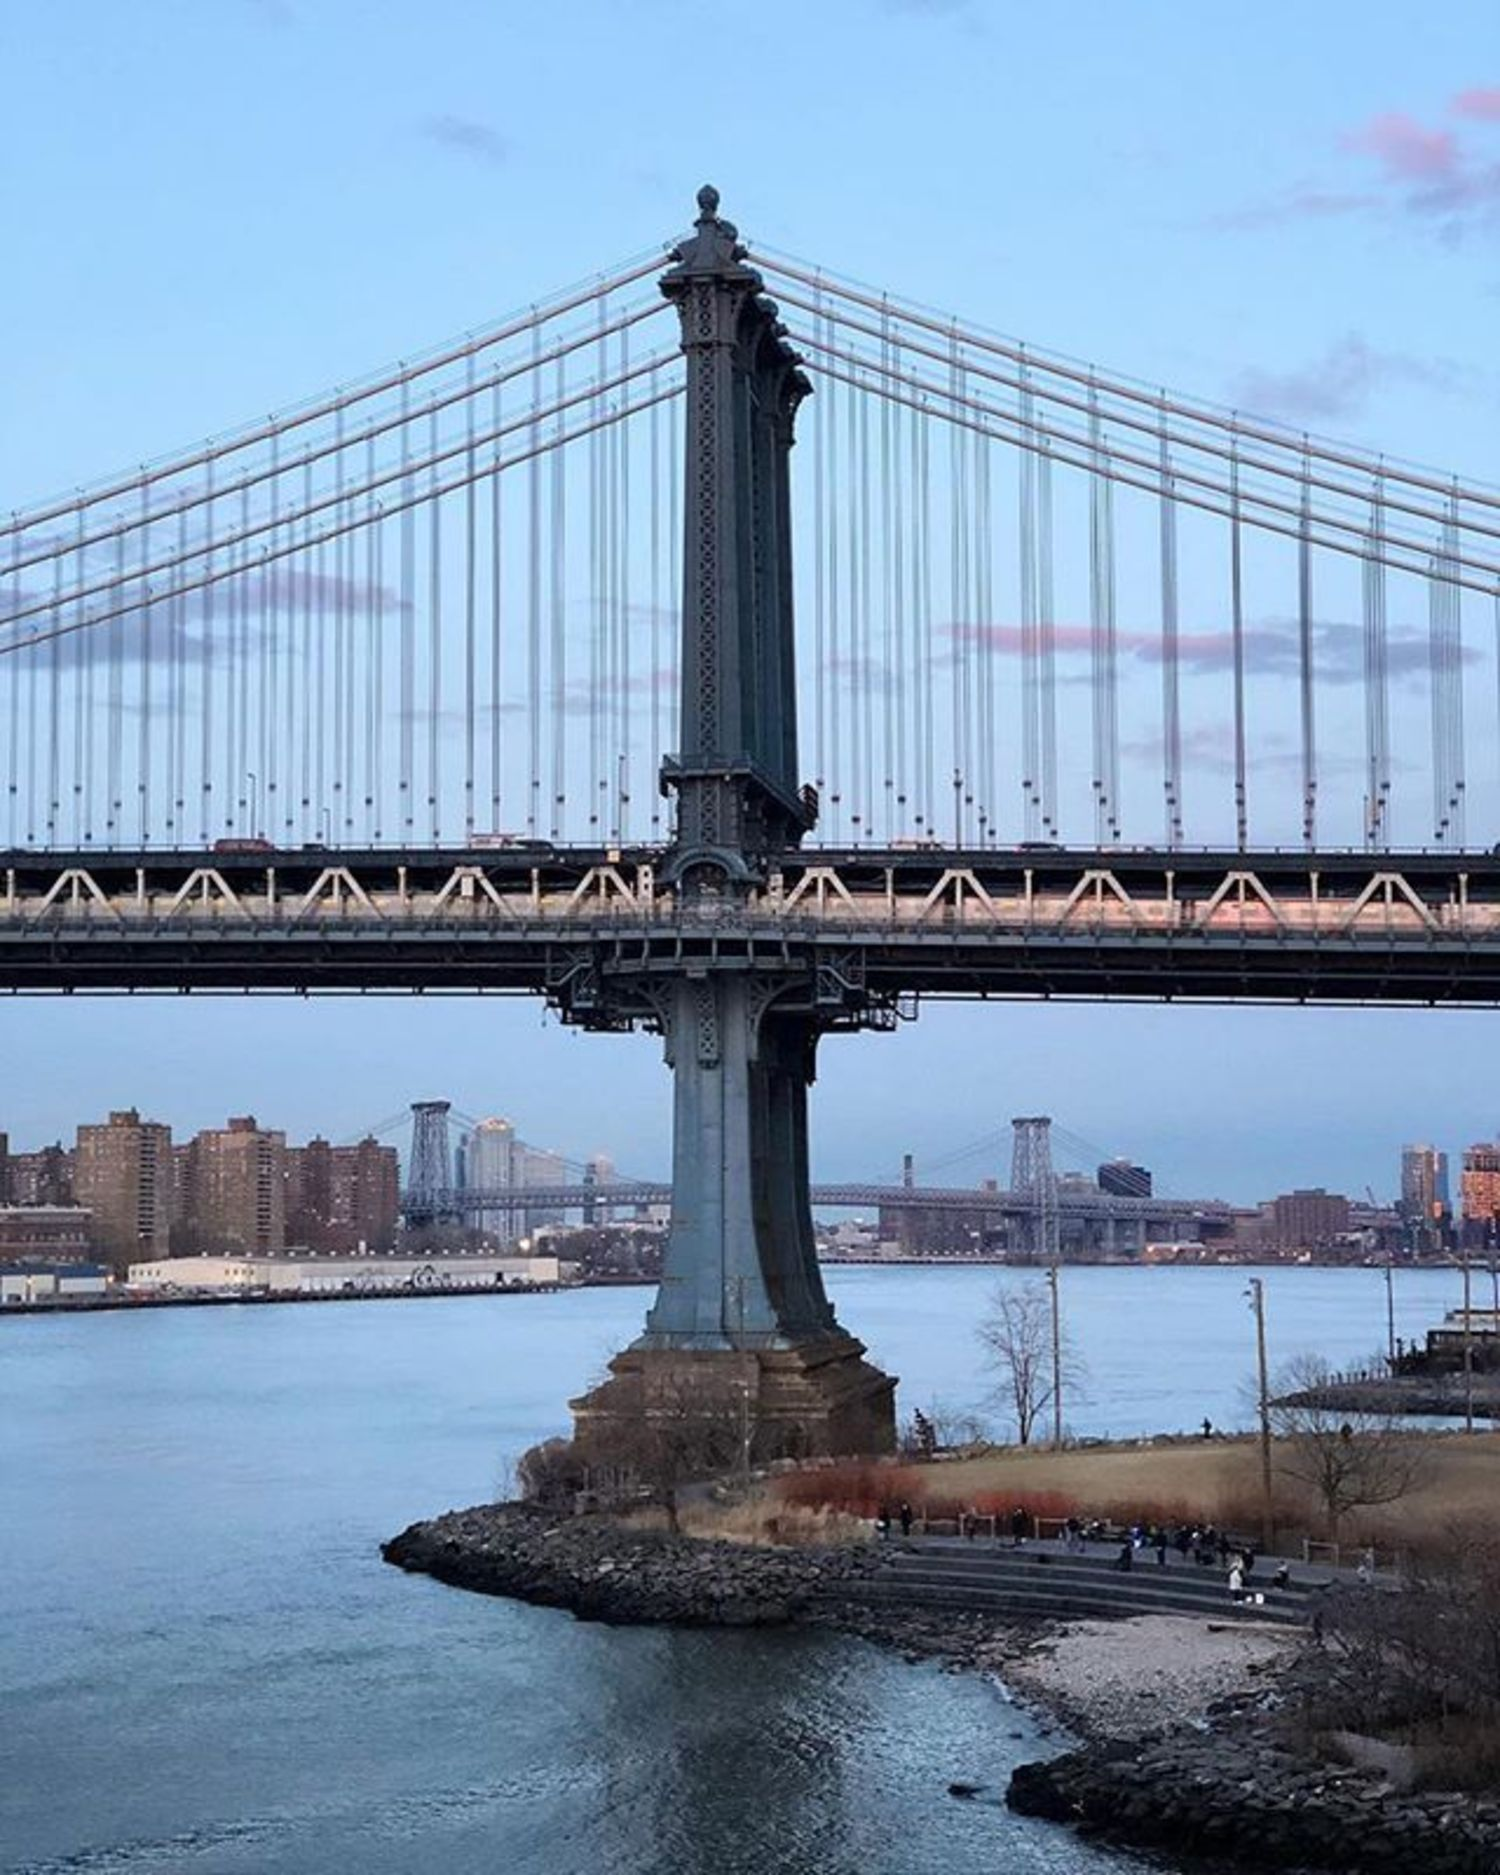 Manhattan Bridge, Brooklyn. Photo via @melliekr #newyork #newyorkcity #nyc #manhattanbridge